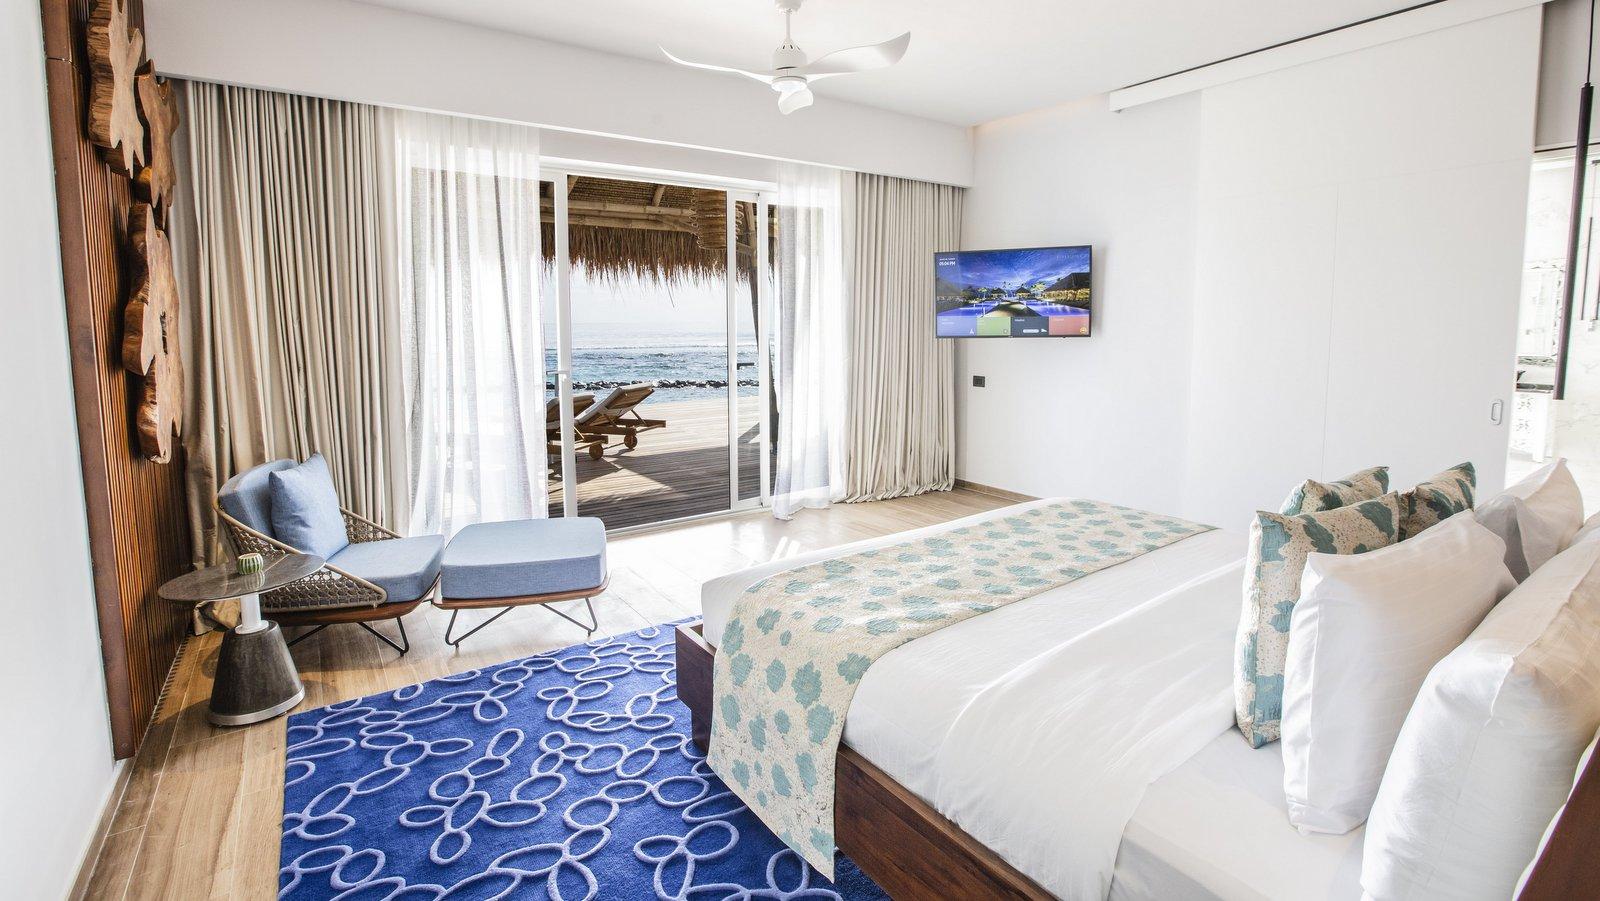 Мальдивы, отель Emerald Maldives Resort & Spa, номер Presidential Water Villa